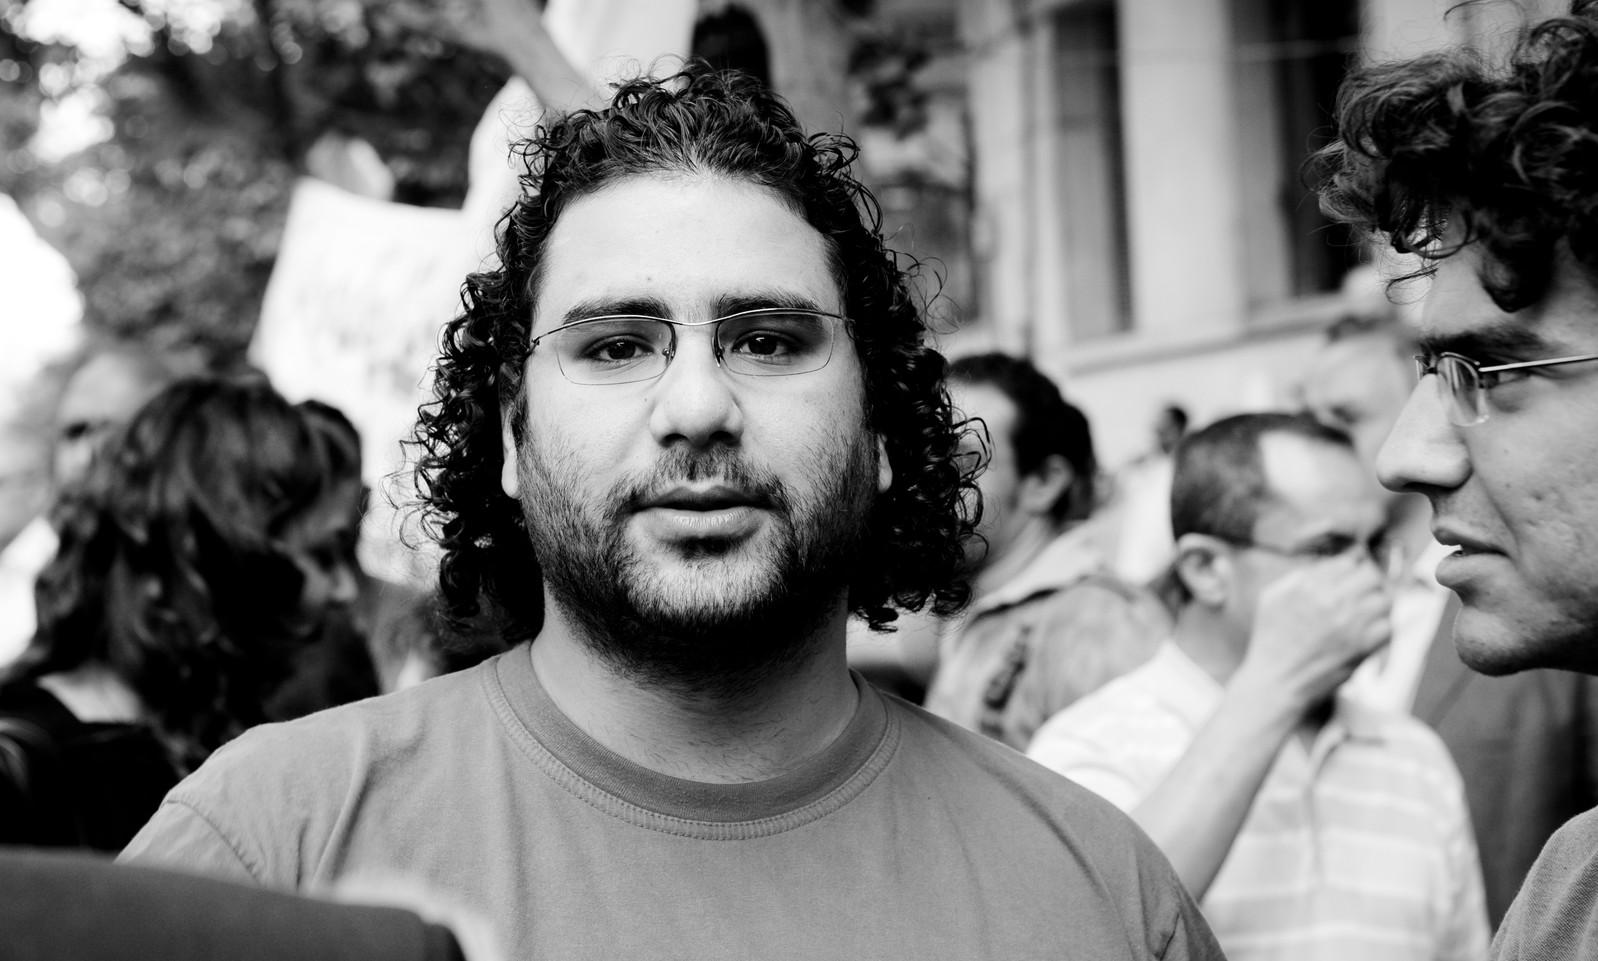 Urgent Action: Egypt – Release Mahienour el-Masrym, Mohamed el-Baqer and Alaa Abdel Fattah